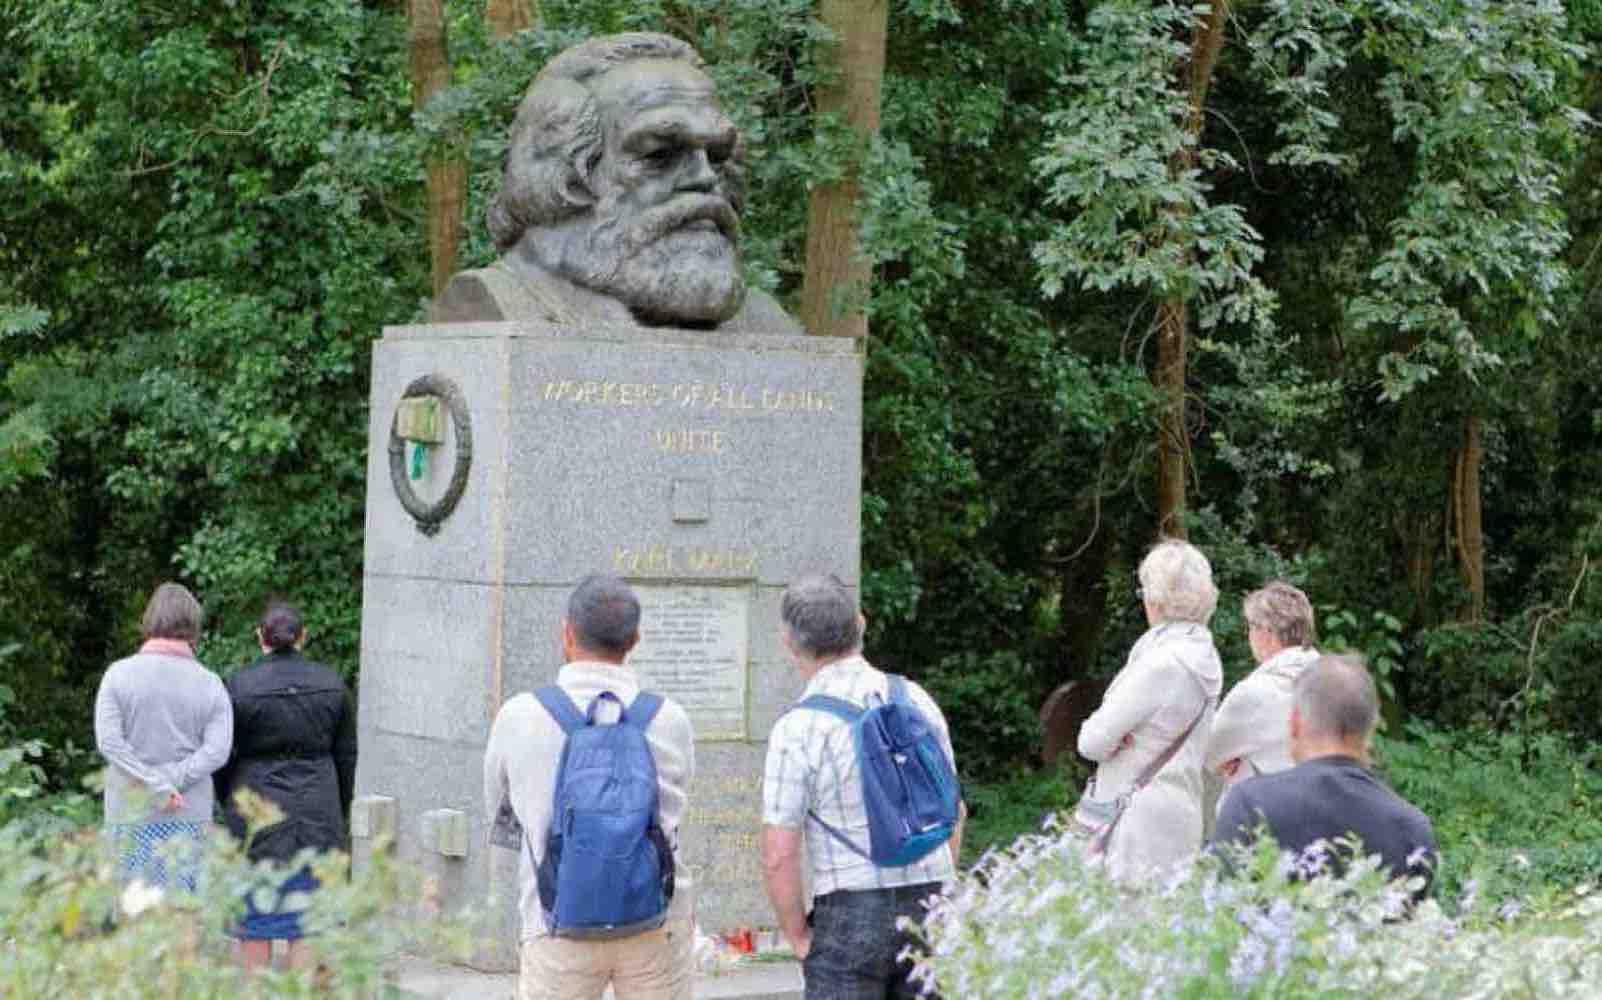 Highgate Cemetery and Karl Marx